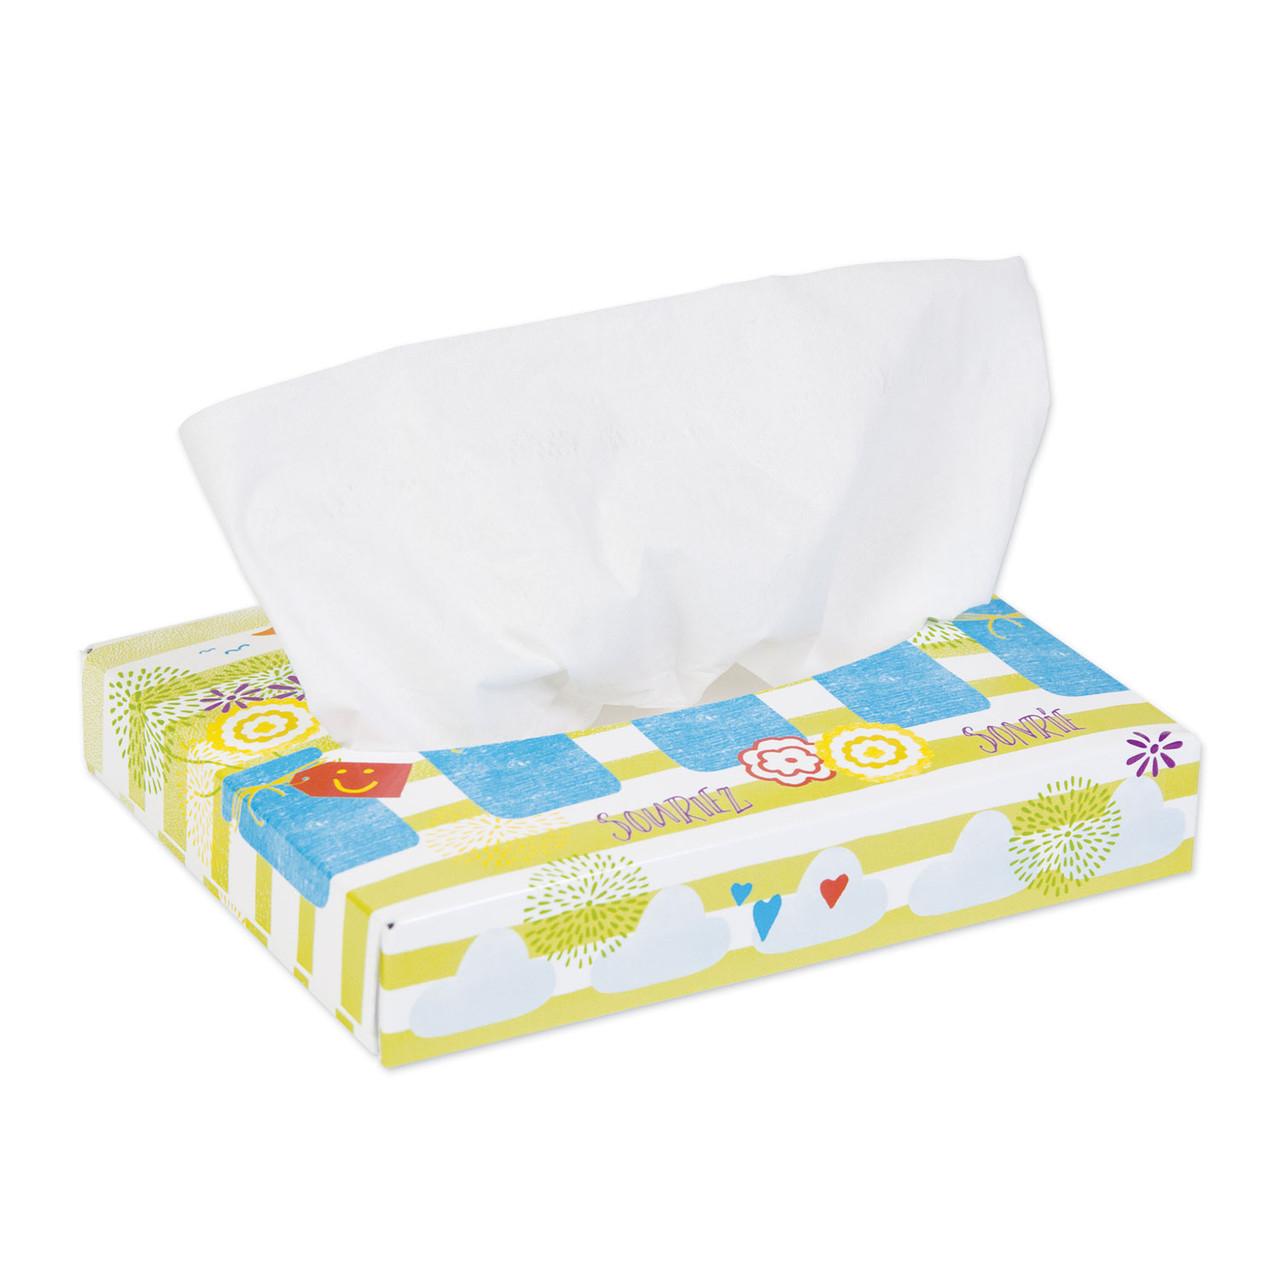 KLEENEX White Facial Tissue Bulk 2 Ply Absorbent Soft Strong 40 Sheets 80 Box